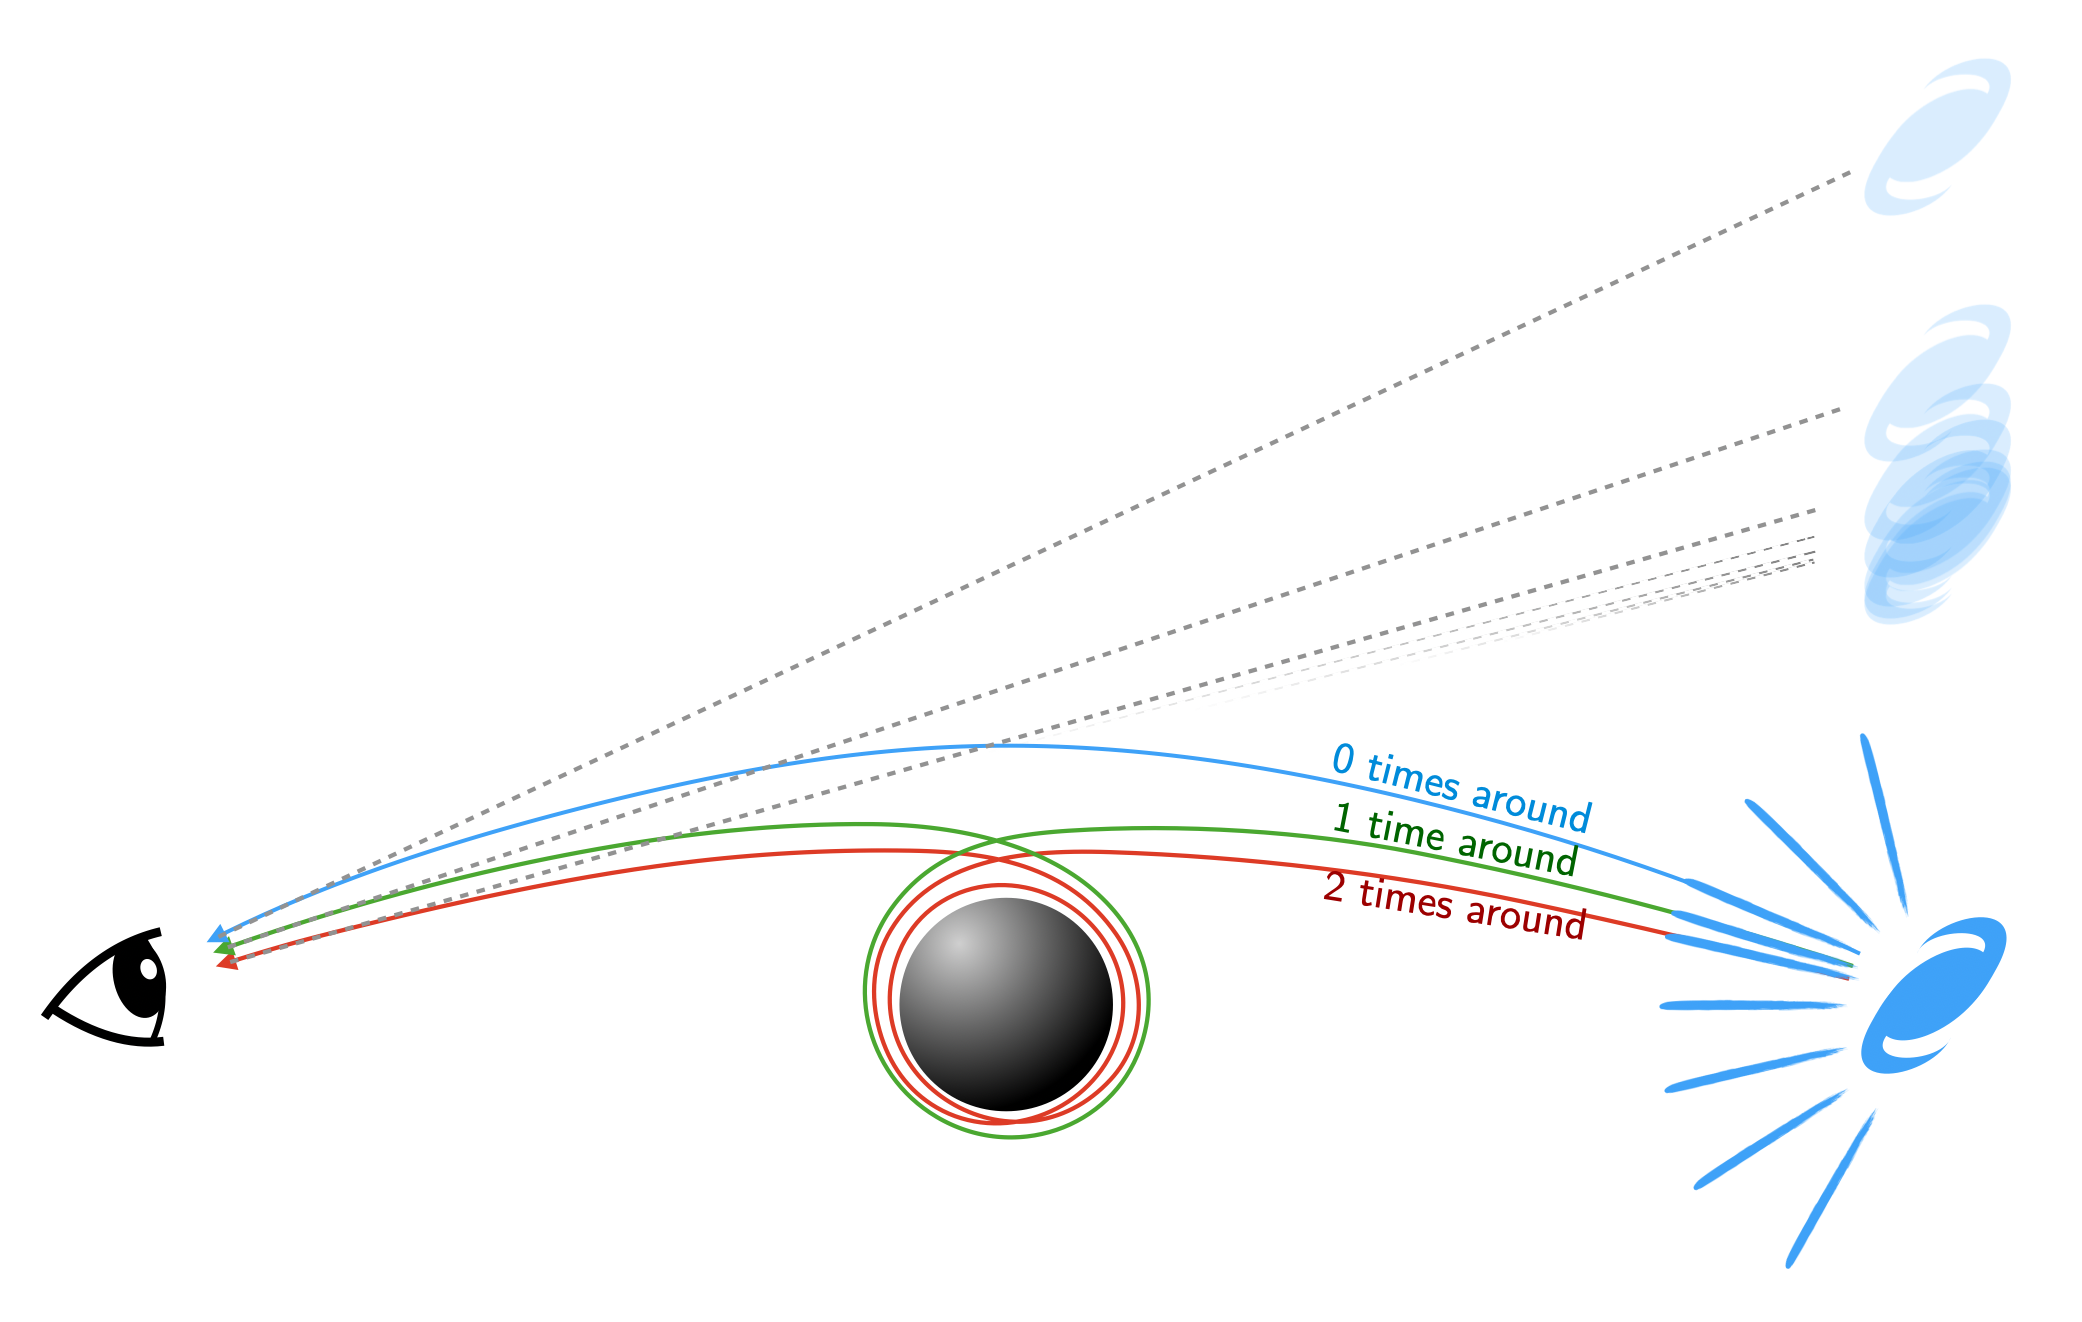 black-hole-multiple-images-eng-1